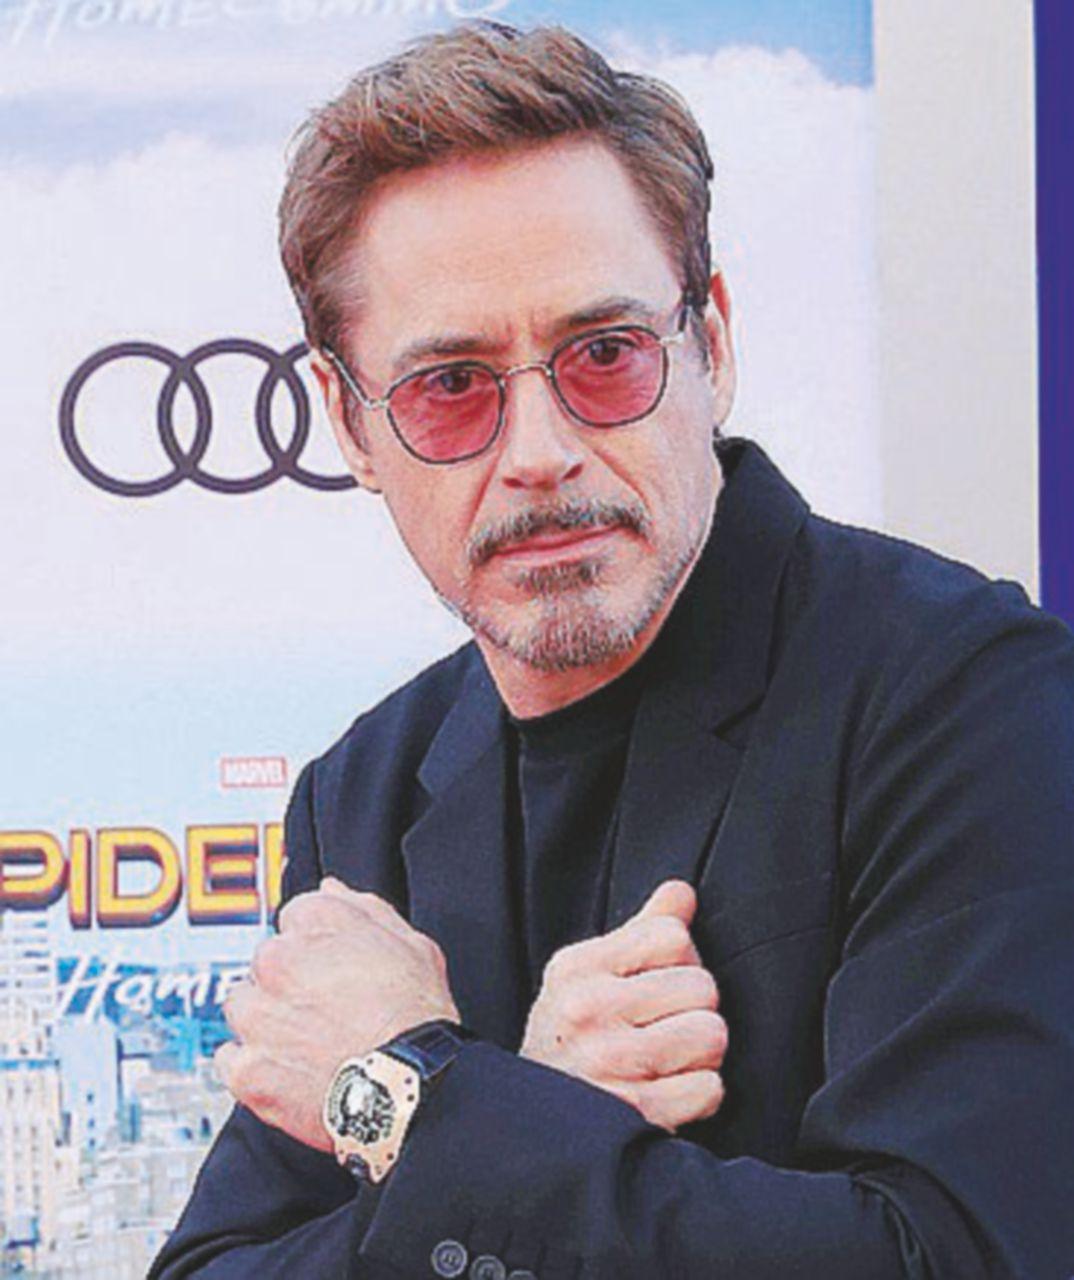 L'iperattiva star Robert Downey: dai Marvel al dott. Dolittle